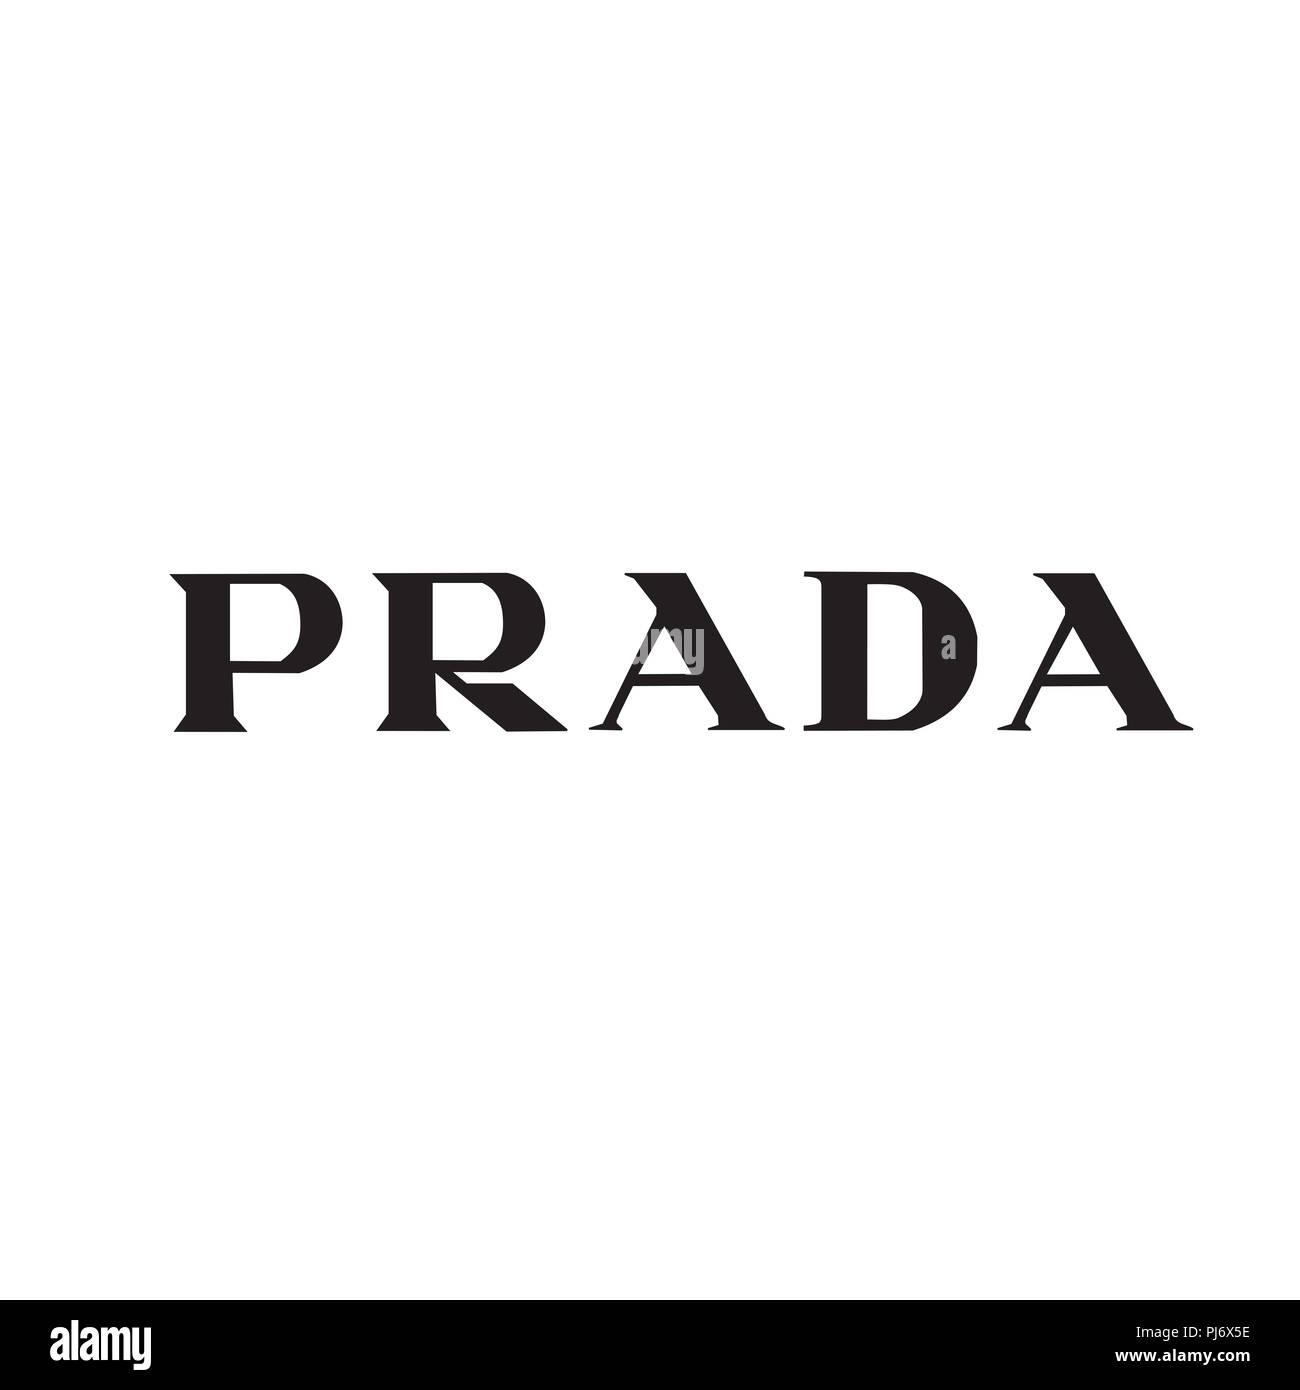 PRADA logo fashion luxury brand italy clothes illustration - Stock Image